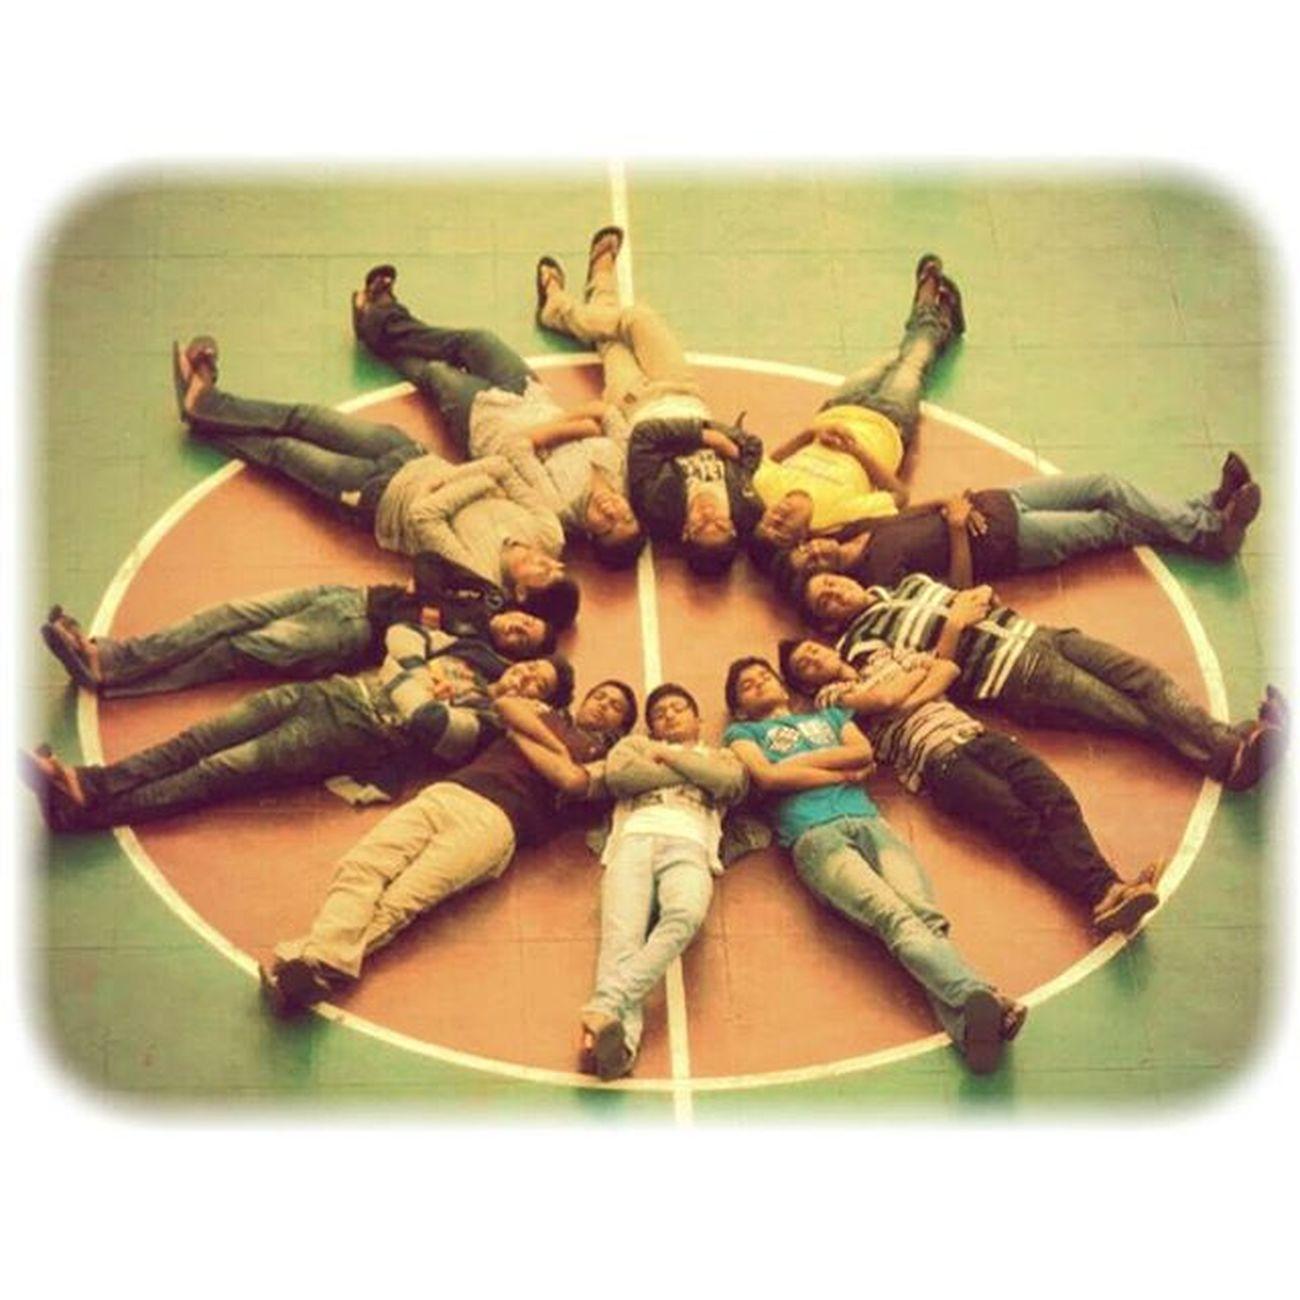 Happiness lies in da Friend circle! Old_image , Miss u ppl 😢